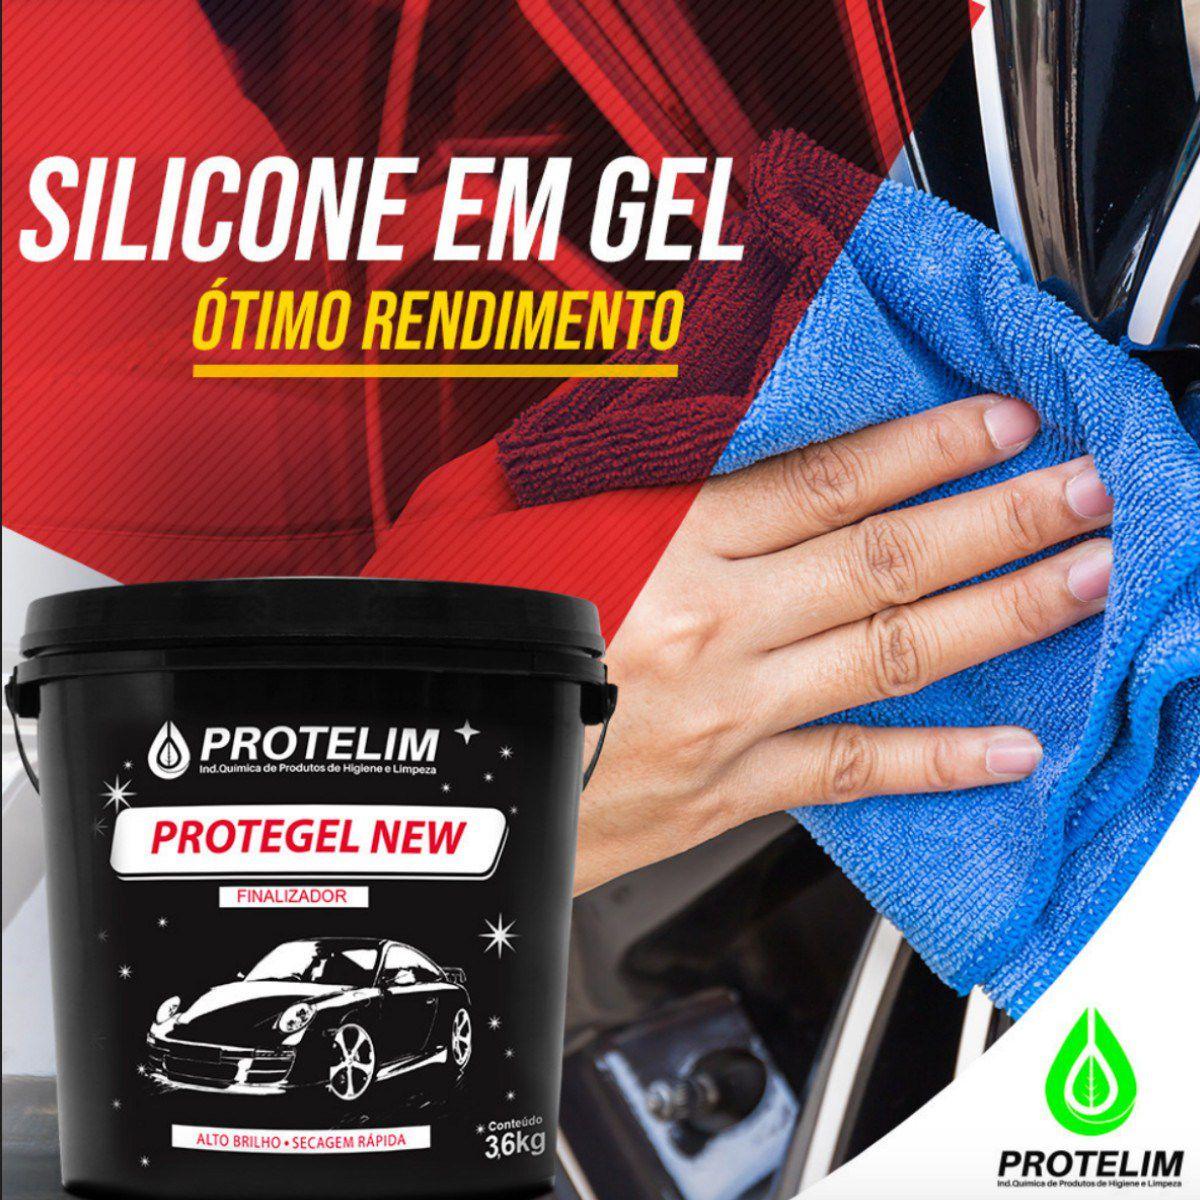 Silicone Gel Protegel New Finalizador Uso Externo 3.6kg Protelim